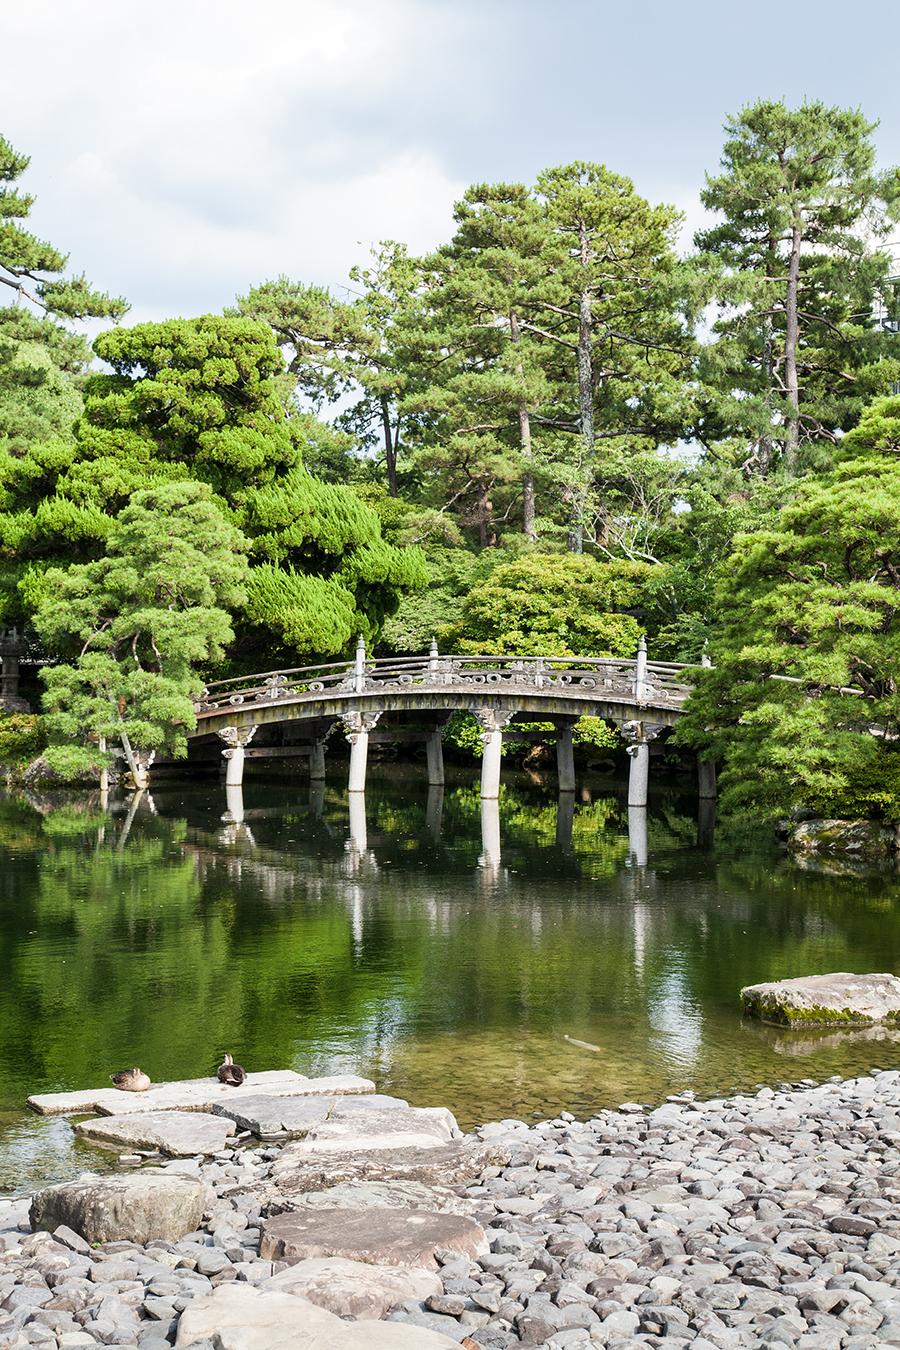 giardino esterno palazzo imperiale kyoto